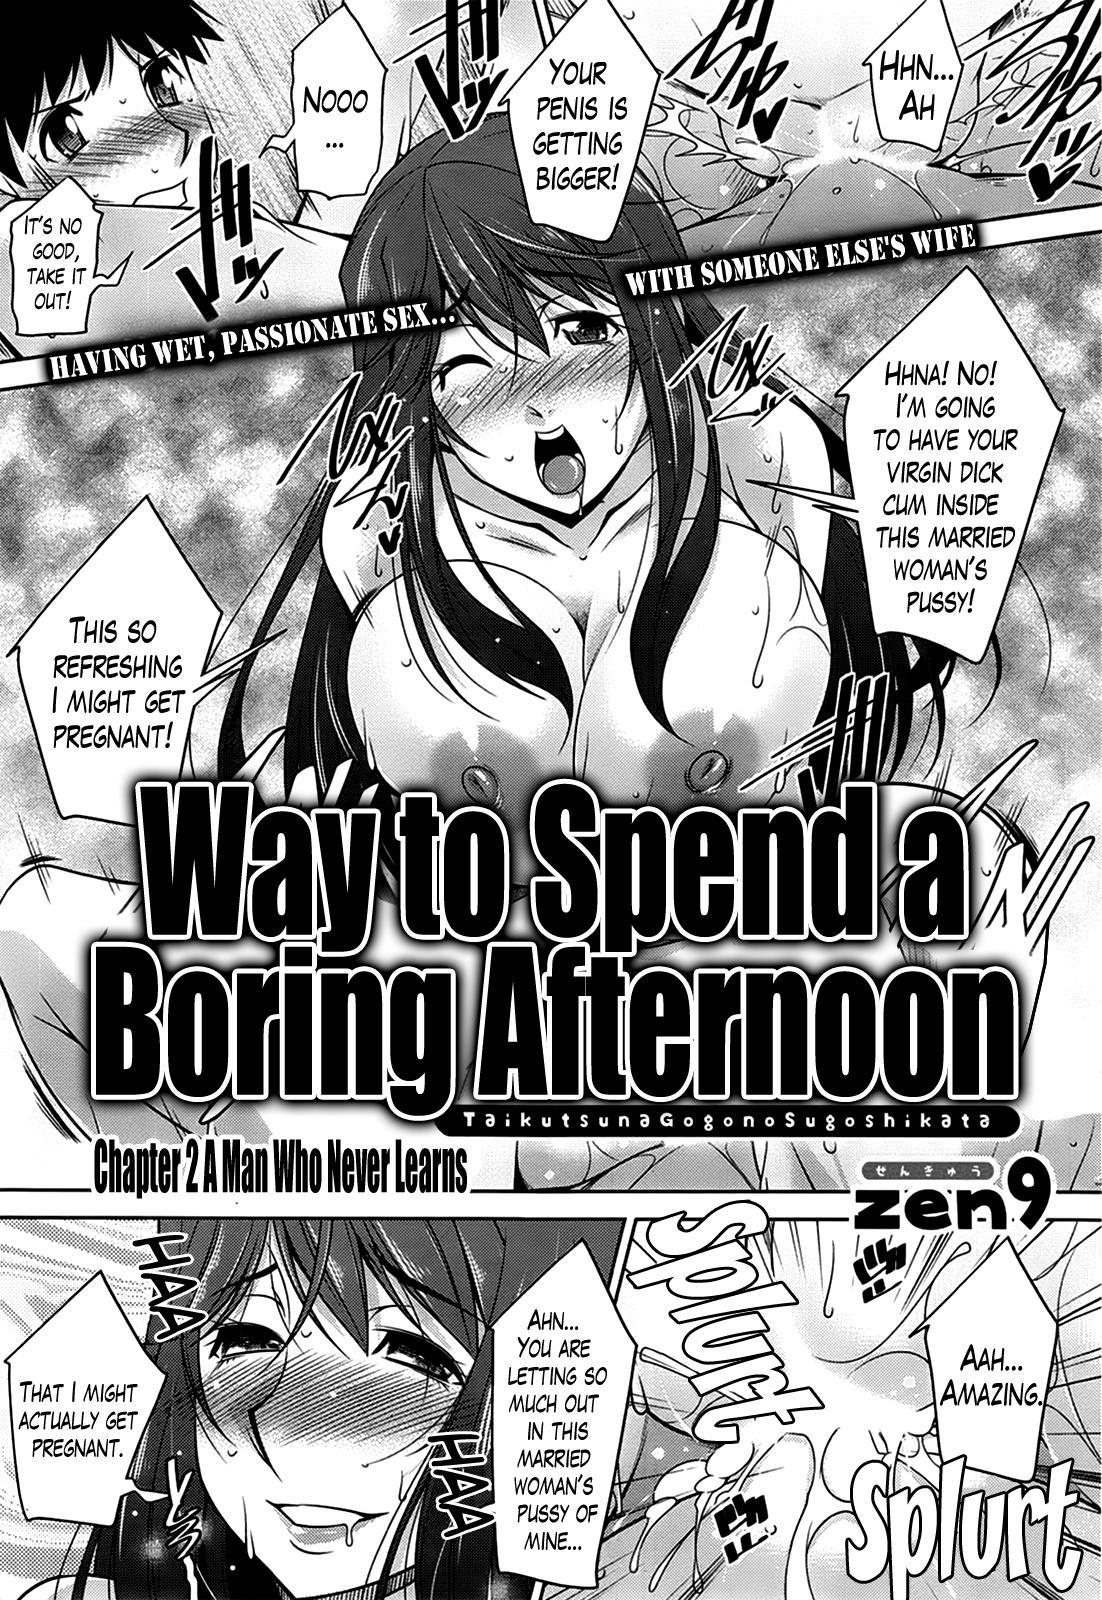 [Zen9] Taikutsu na Gogo no Sugoshikata Ch. 1-5   A Way to Spend a Boring Afternoon Ch. 1-5 (Action Pizazz DX 2013-12) [English](hentai2read.com)[Lazarus H] 20